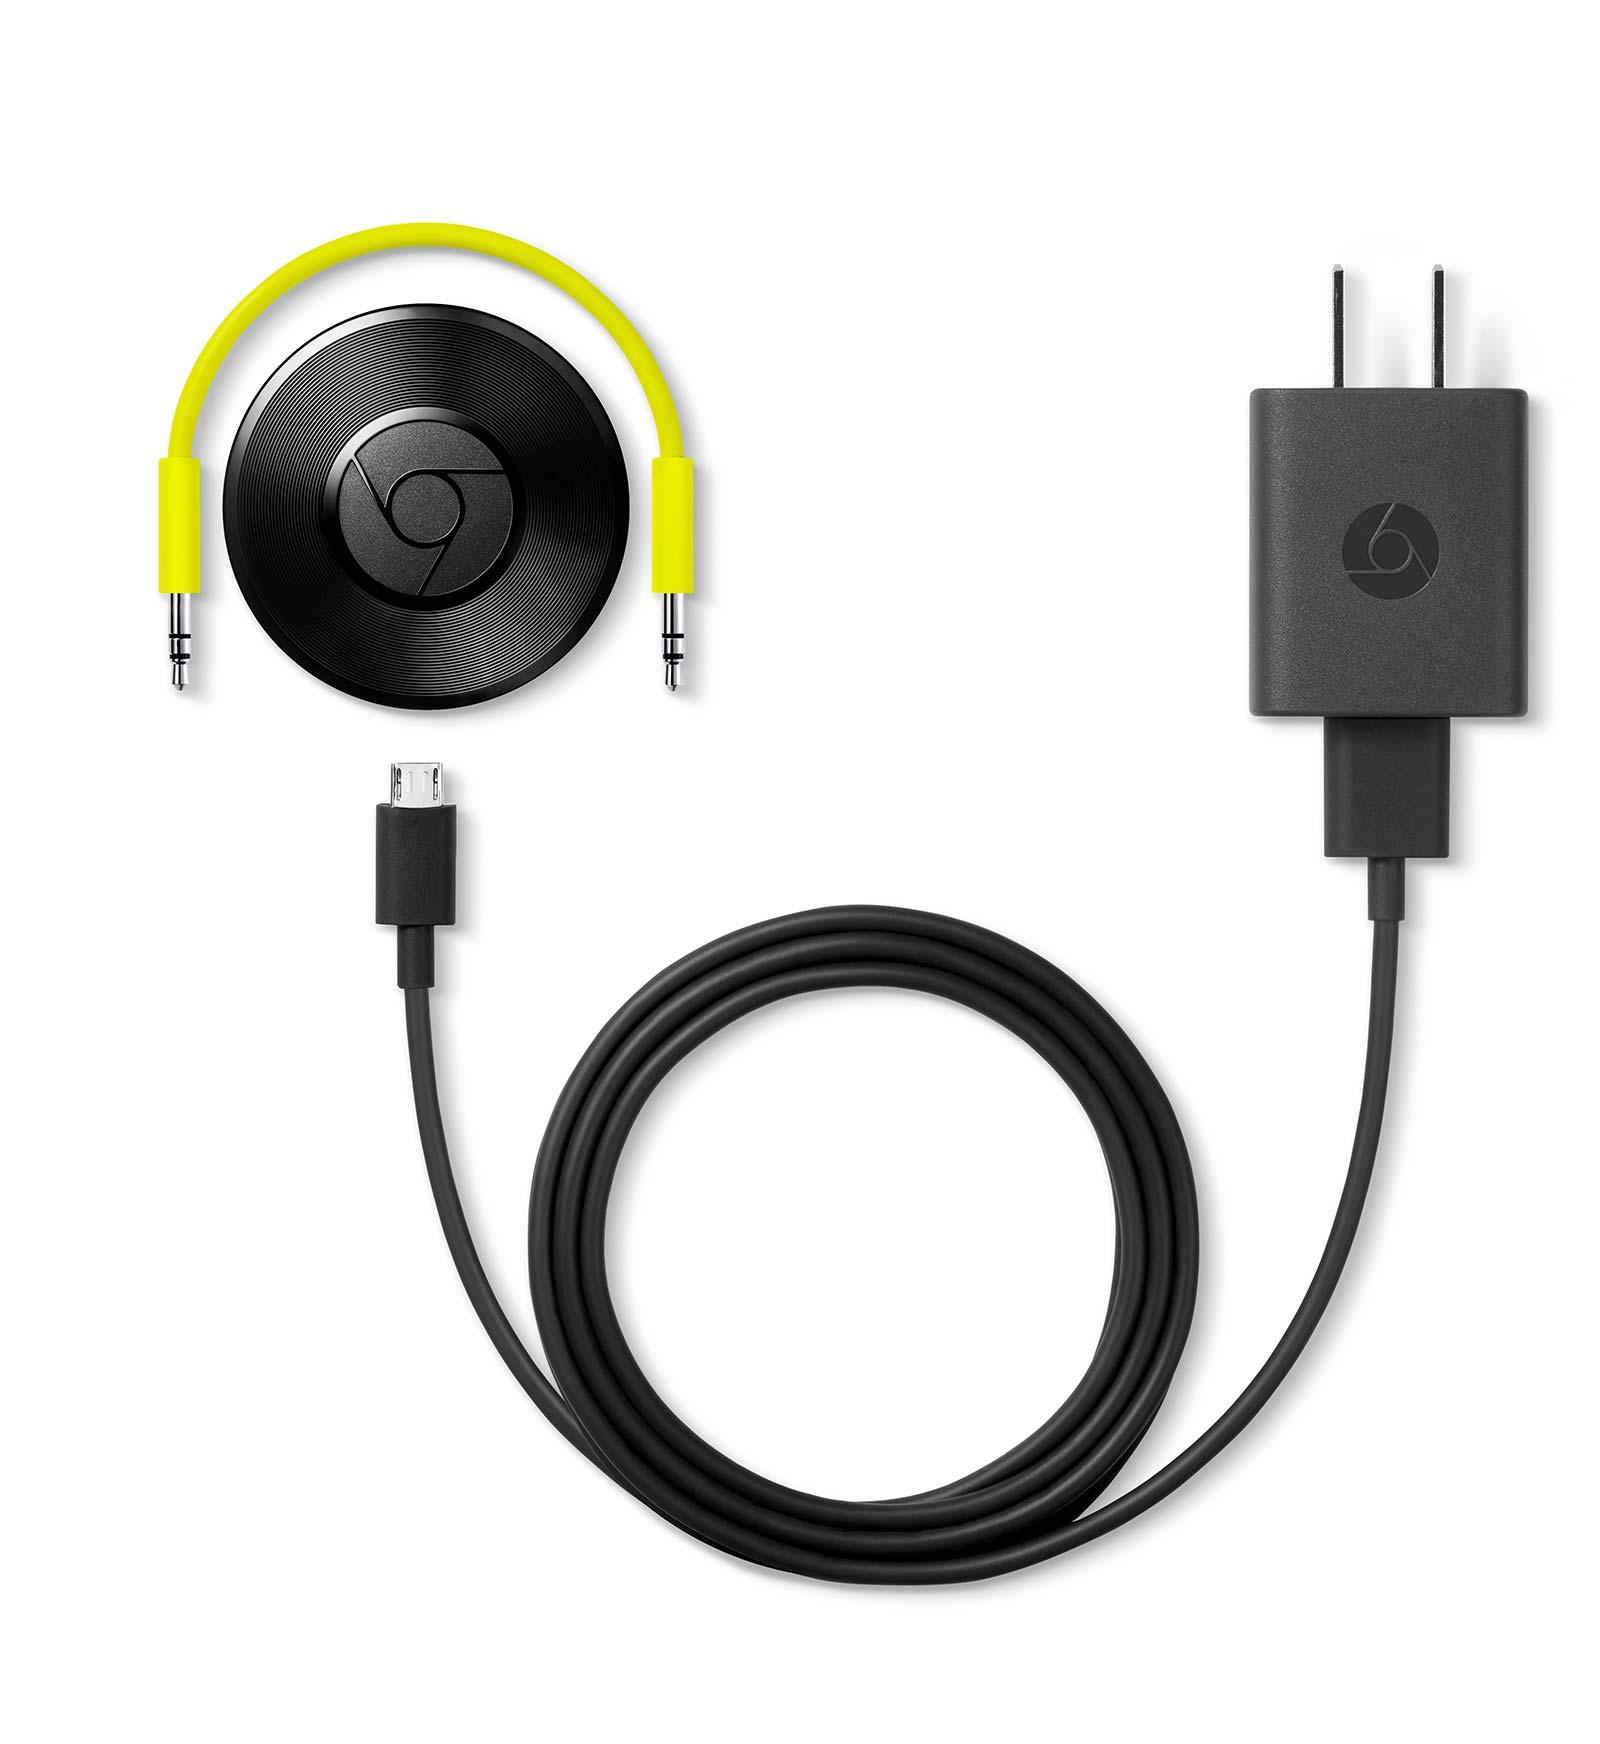 Buy - Chromecast - Google